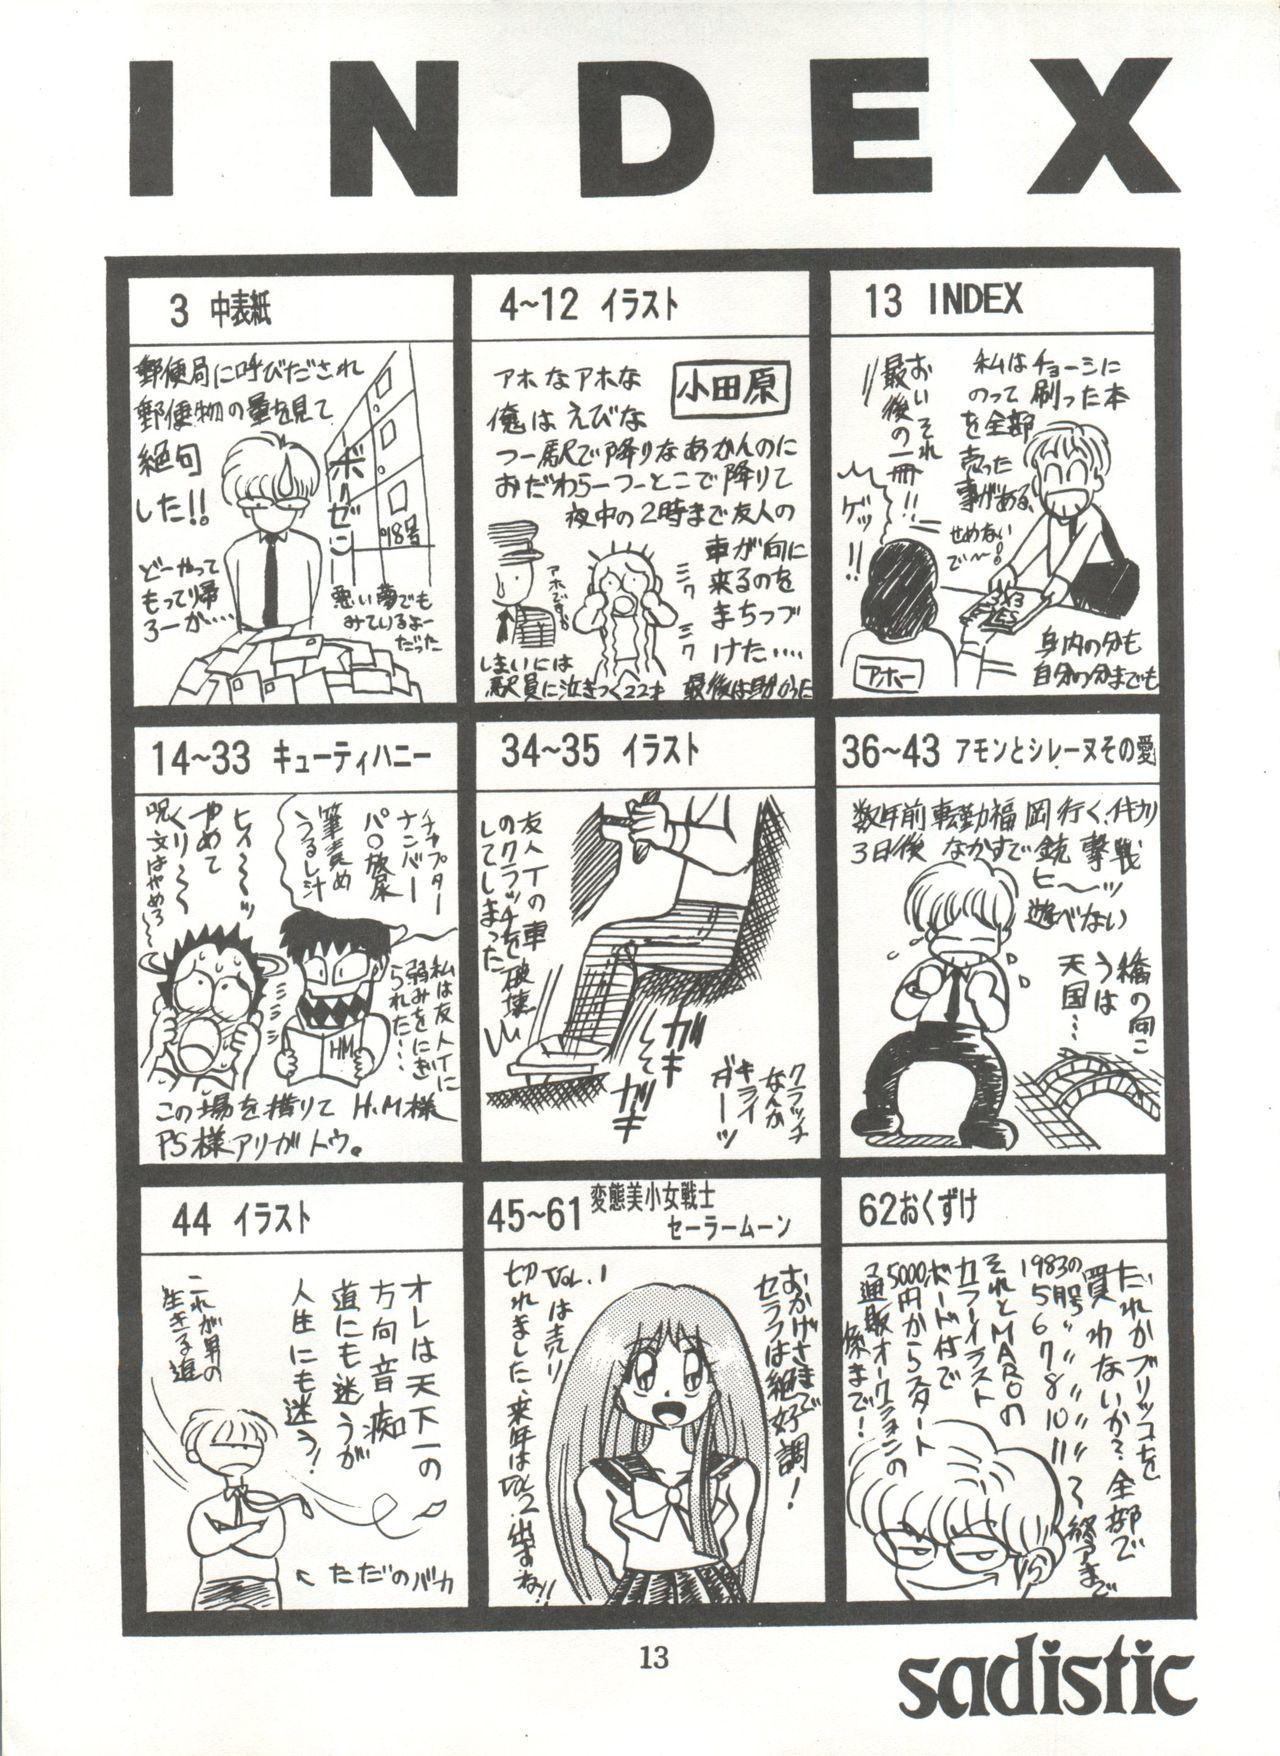 [Global One (MARO)] Sadistic 5 (Cutey Honey, Devilman, Sailor Moon), [Global One (MARO)] Sadistic (Dirty Pair, Fushigi no Umi no Nadia, Sailor Moon), [Studio Ikkatsumajin] .ribbon (Hime-chan's Ribbon) 12